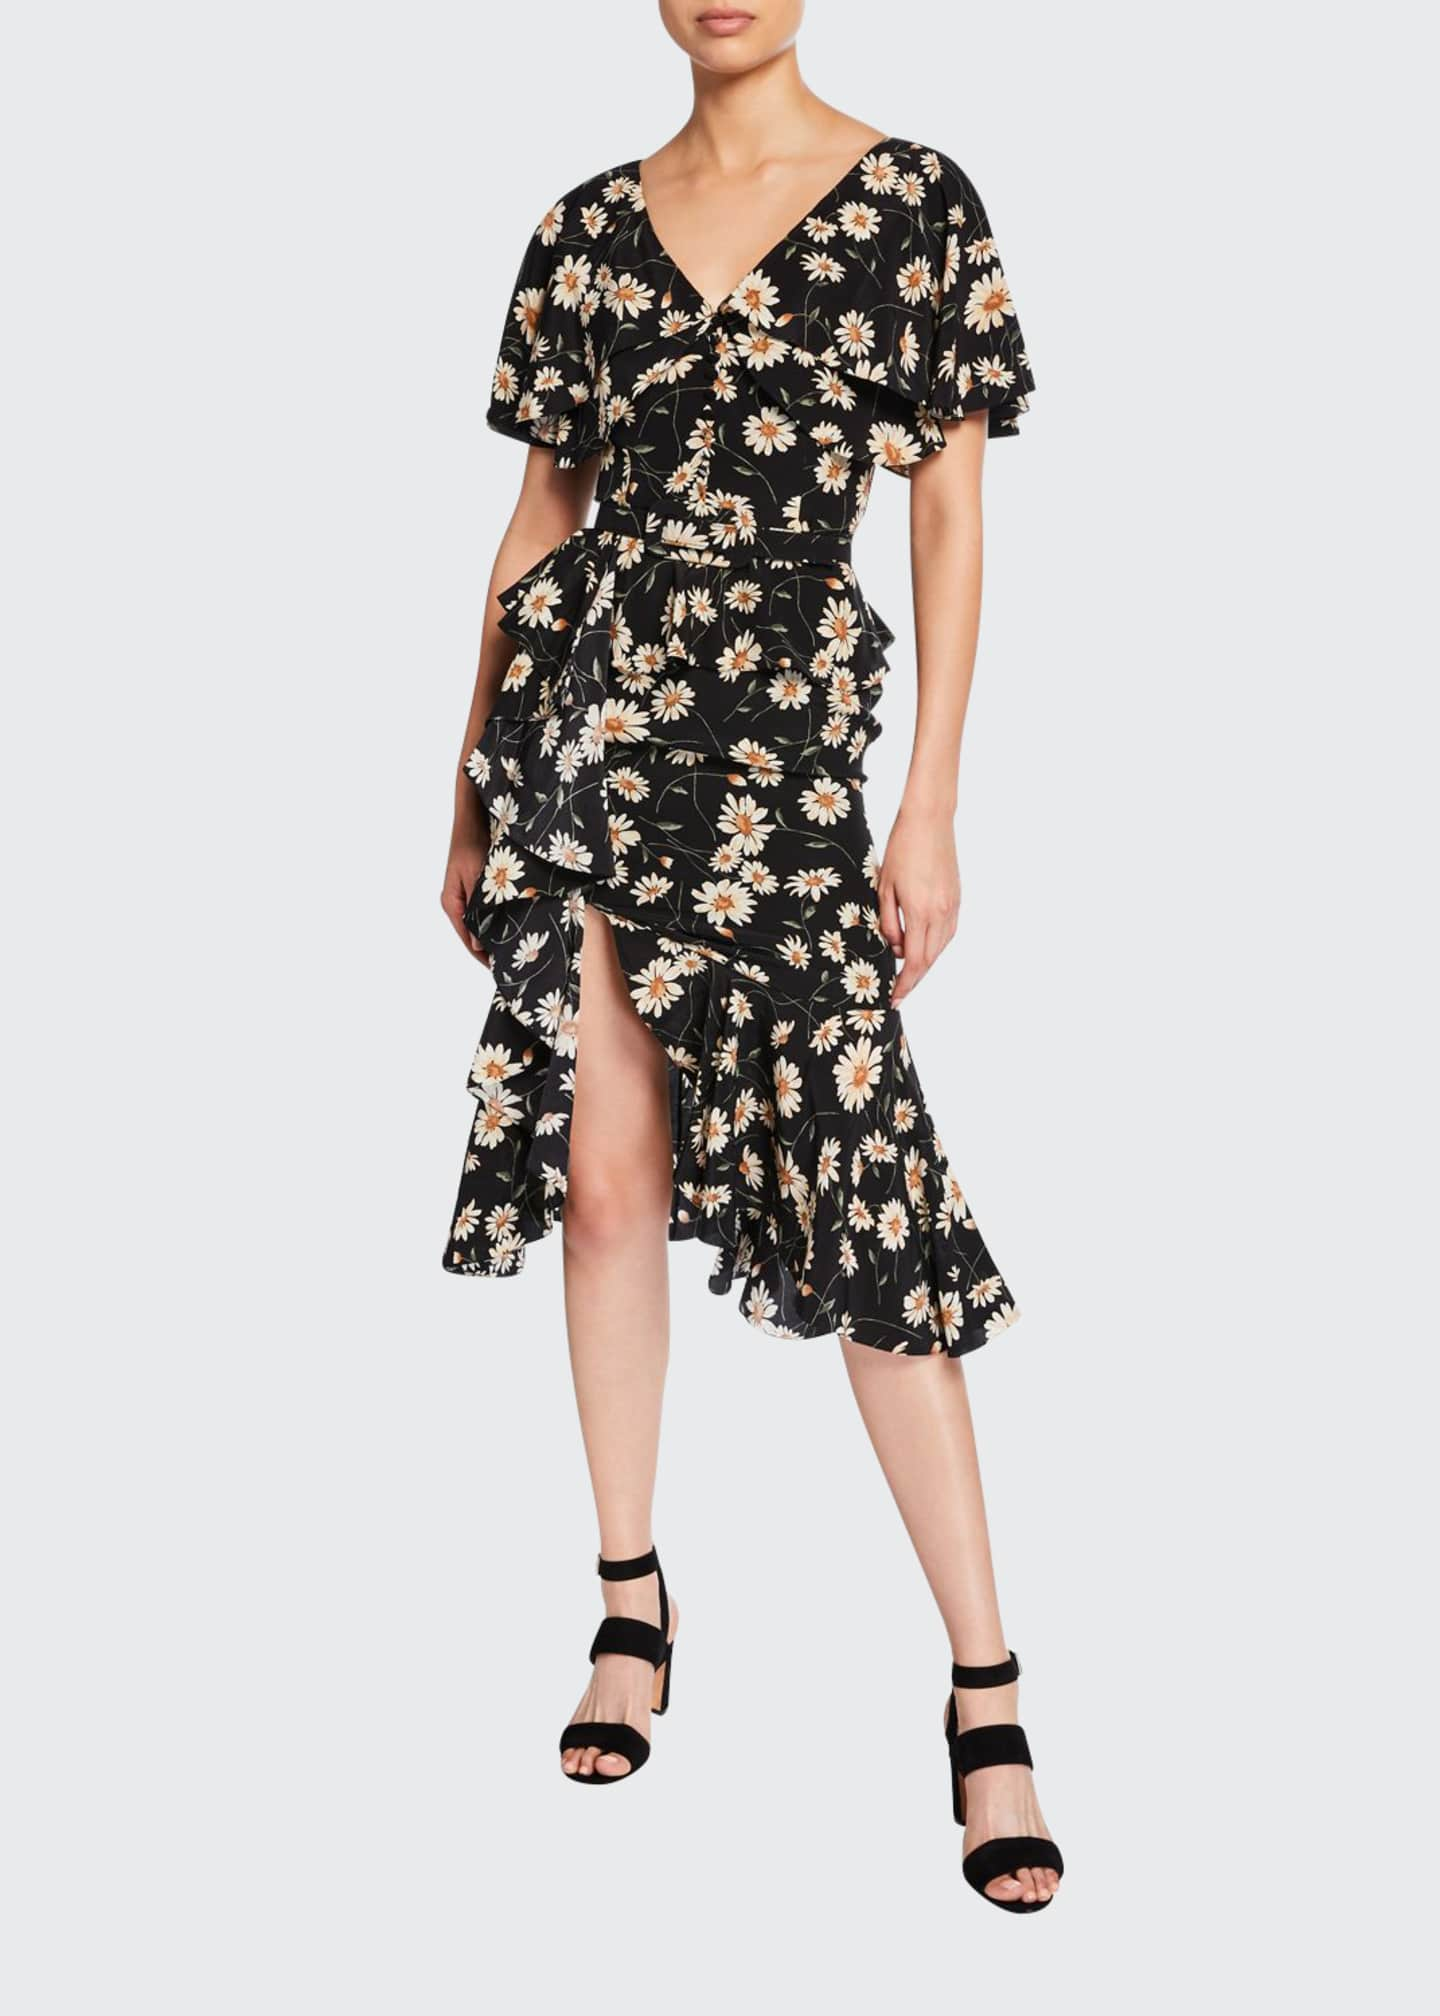 Michael Kors Collection Cascading Cape-Sleeve Dress